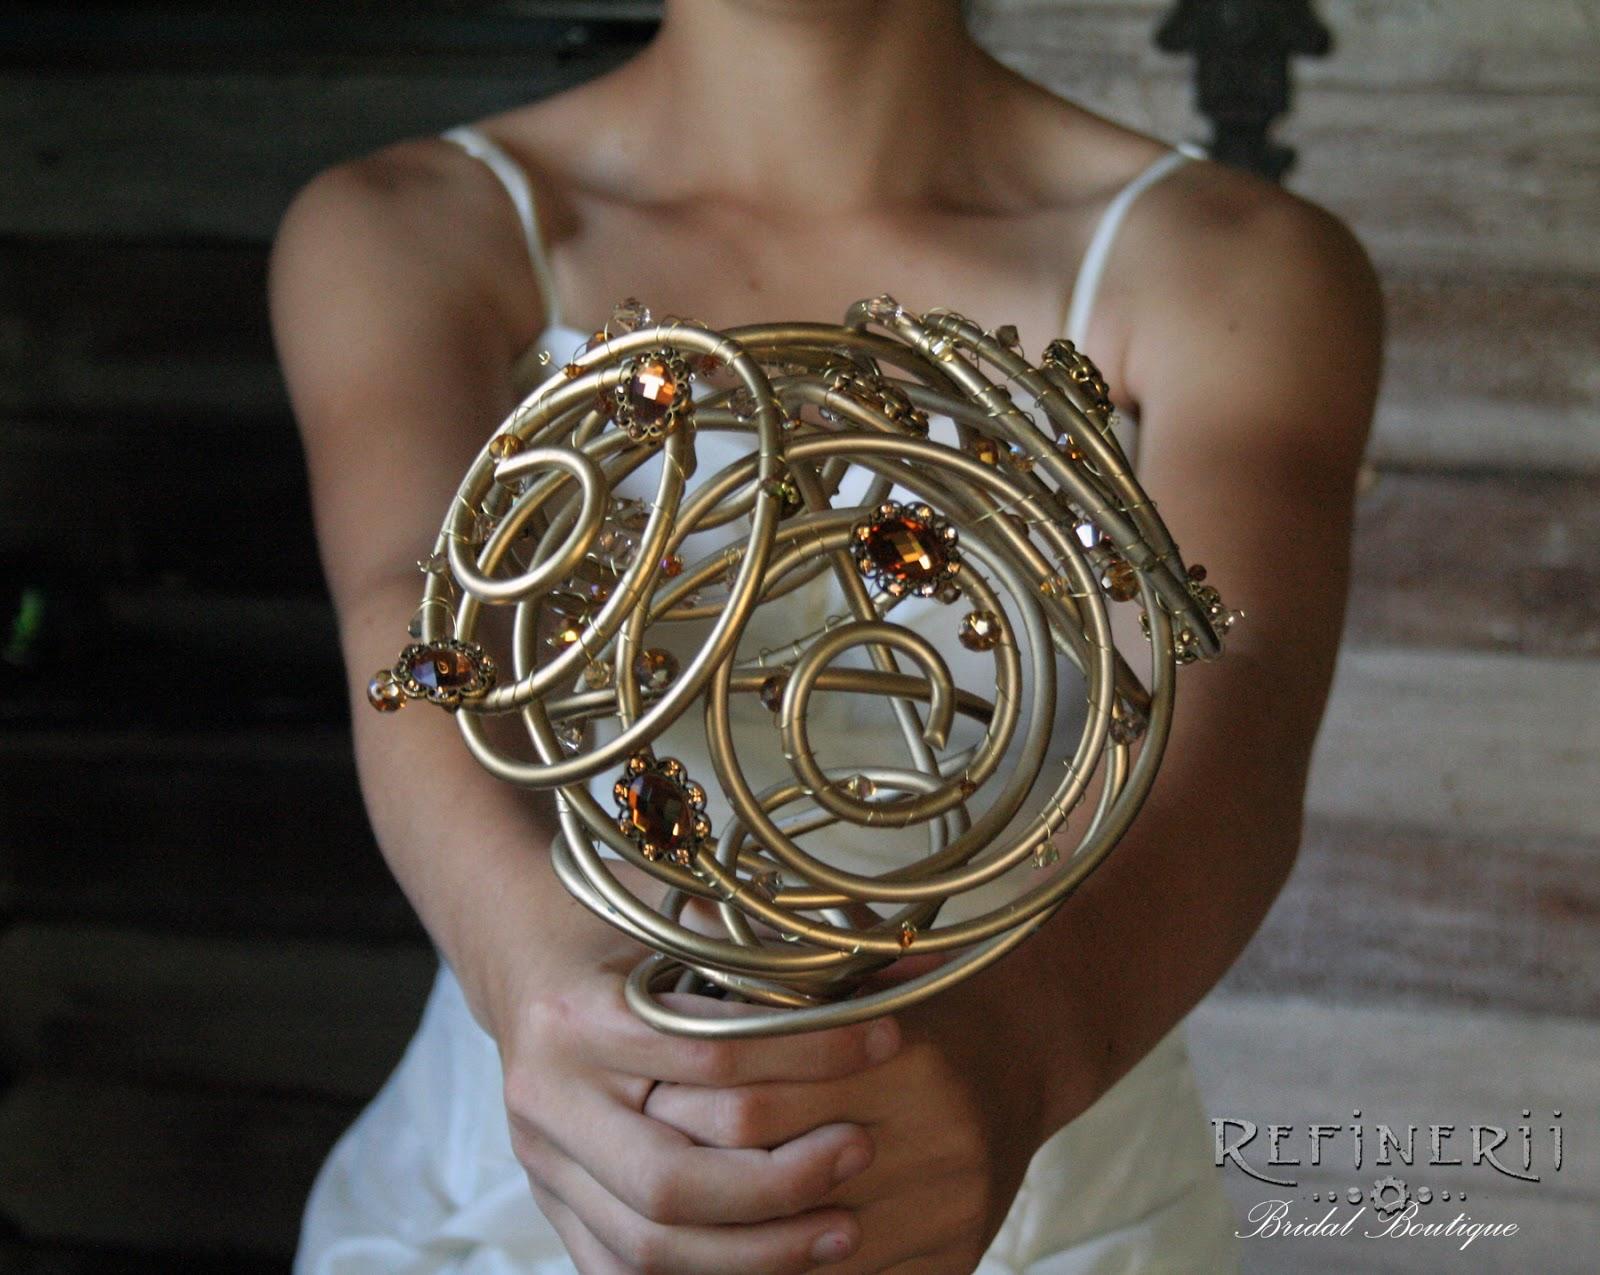 Golden Bridal Bouquet : Refinerii studios new alternative wedding bouquets made